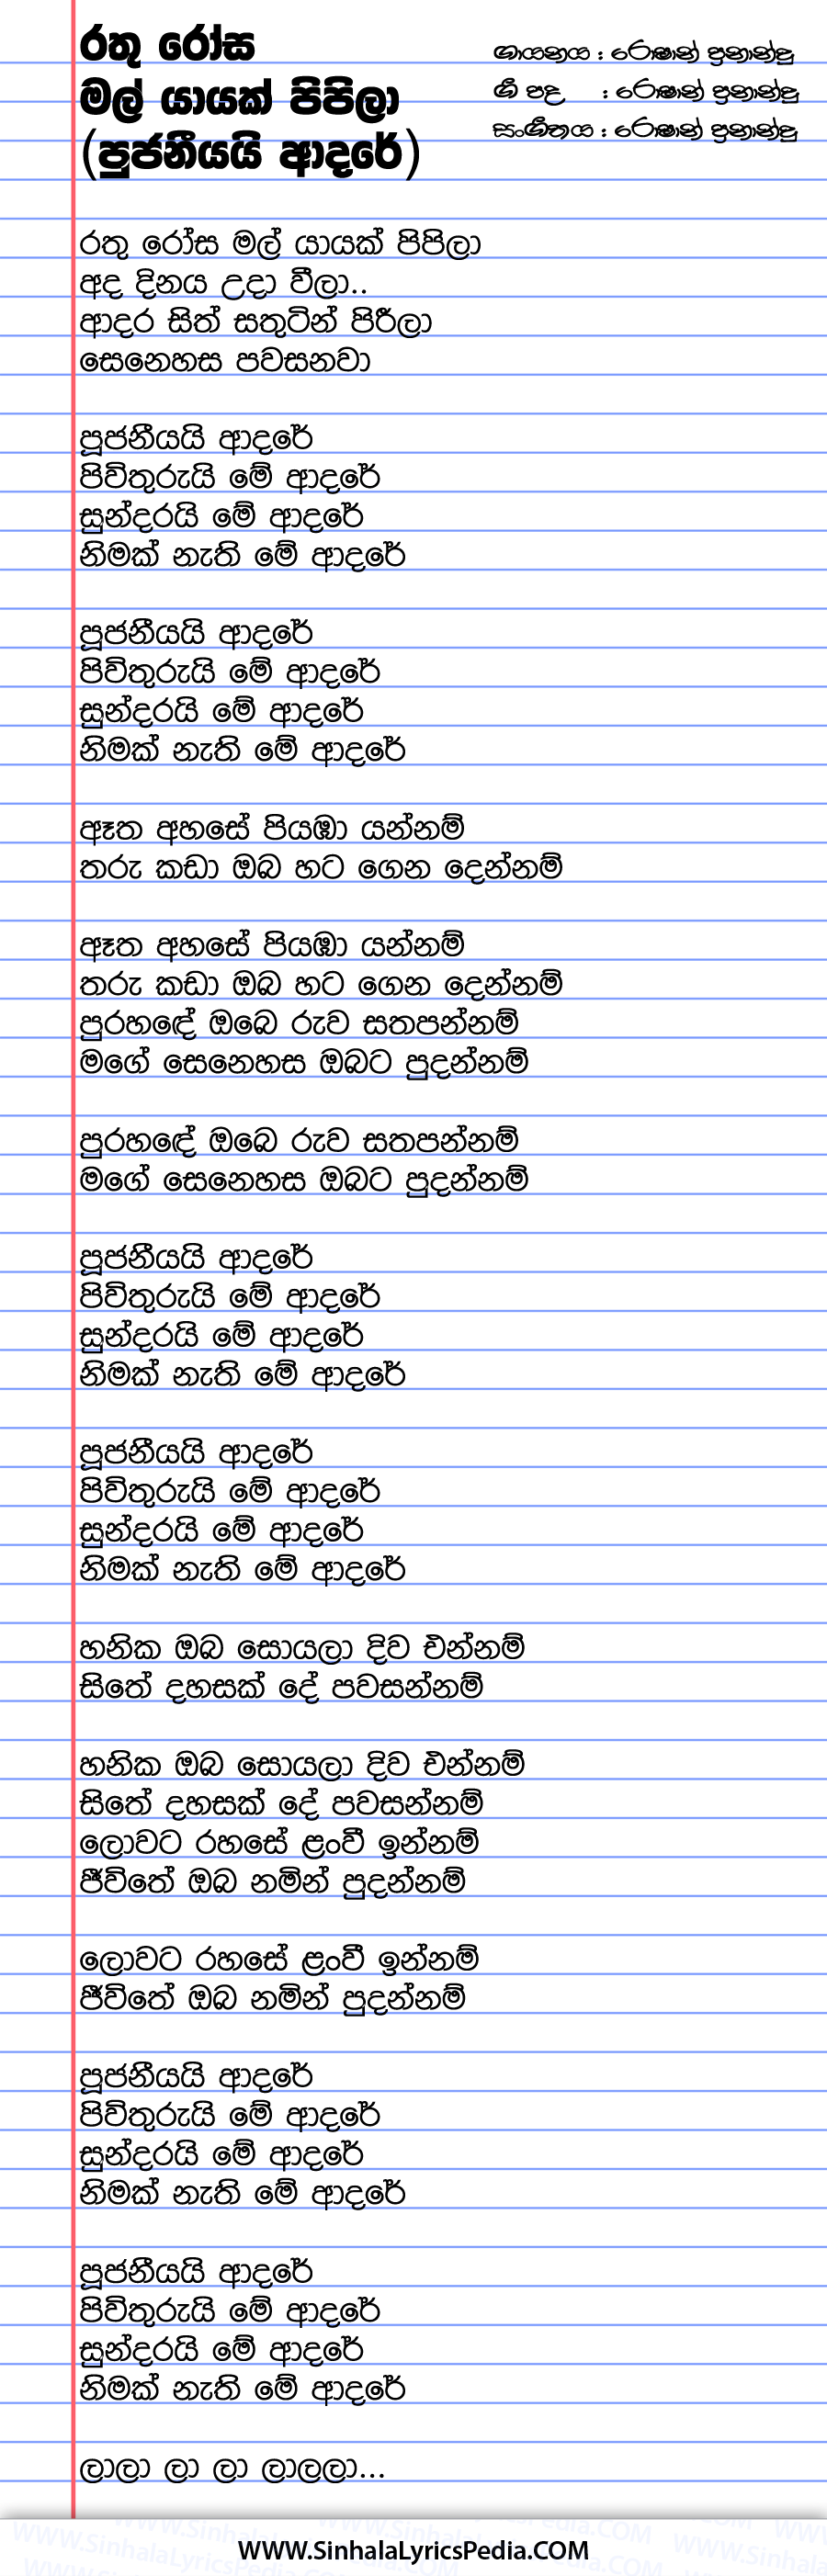 Rathu Rosa Mal Yayak Pipila (Poojaneeyai Adare) Song Lyrics